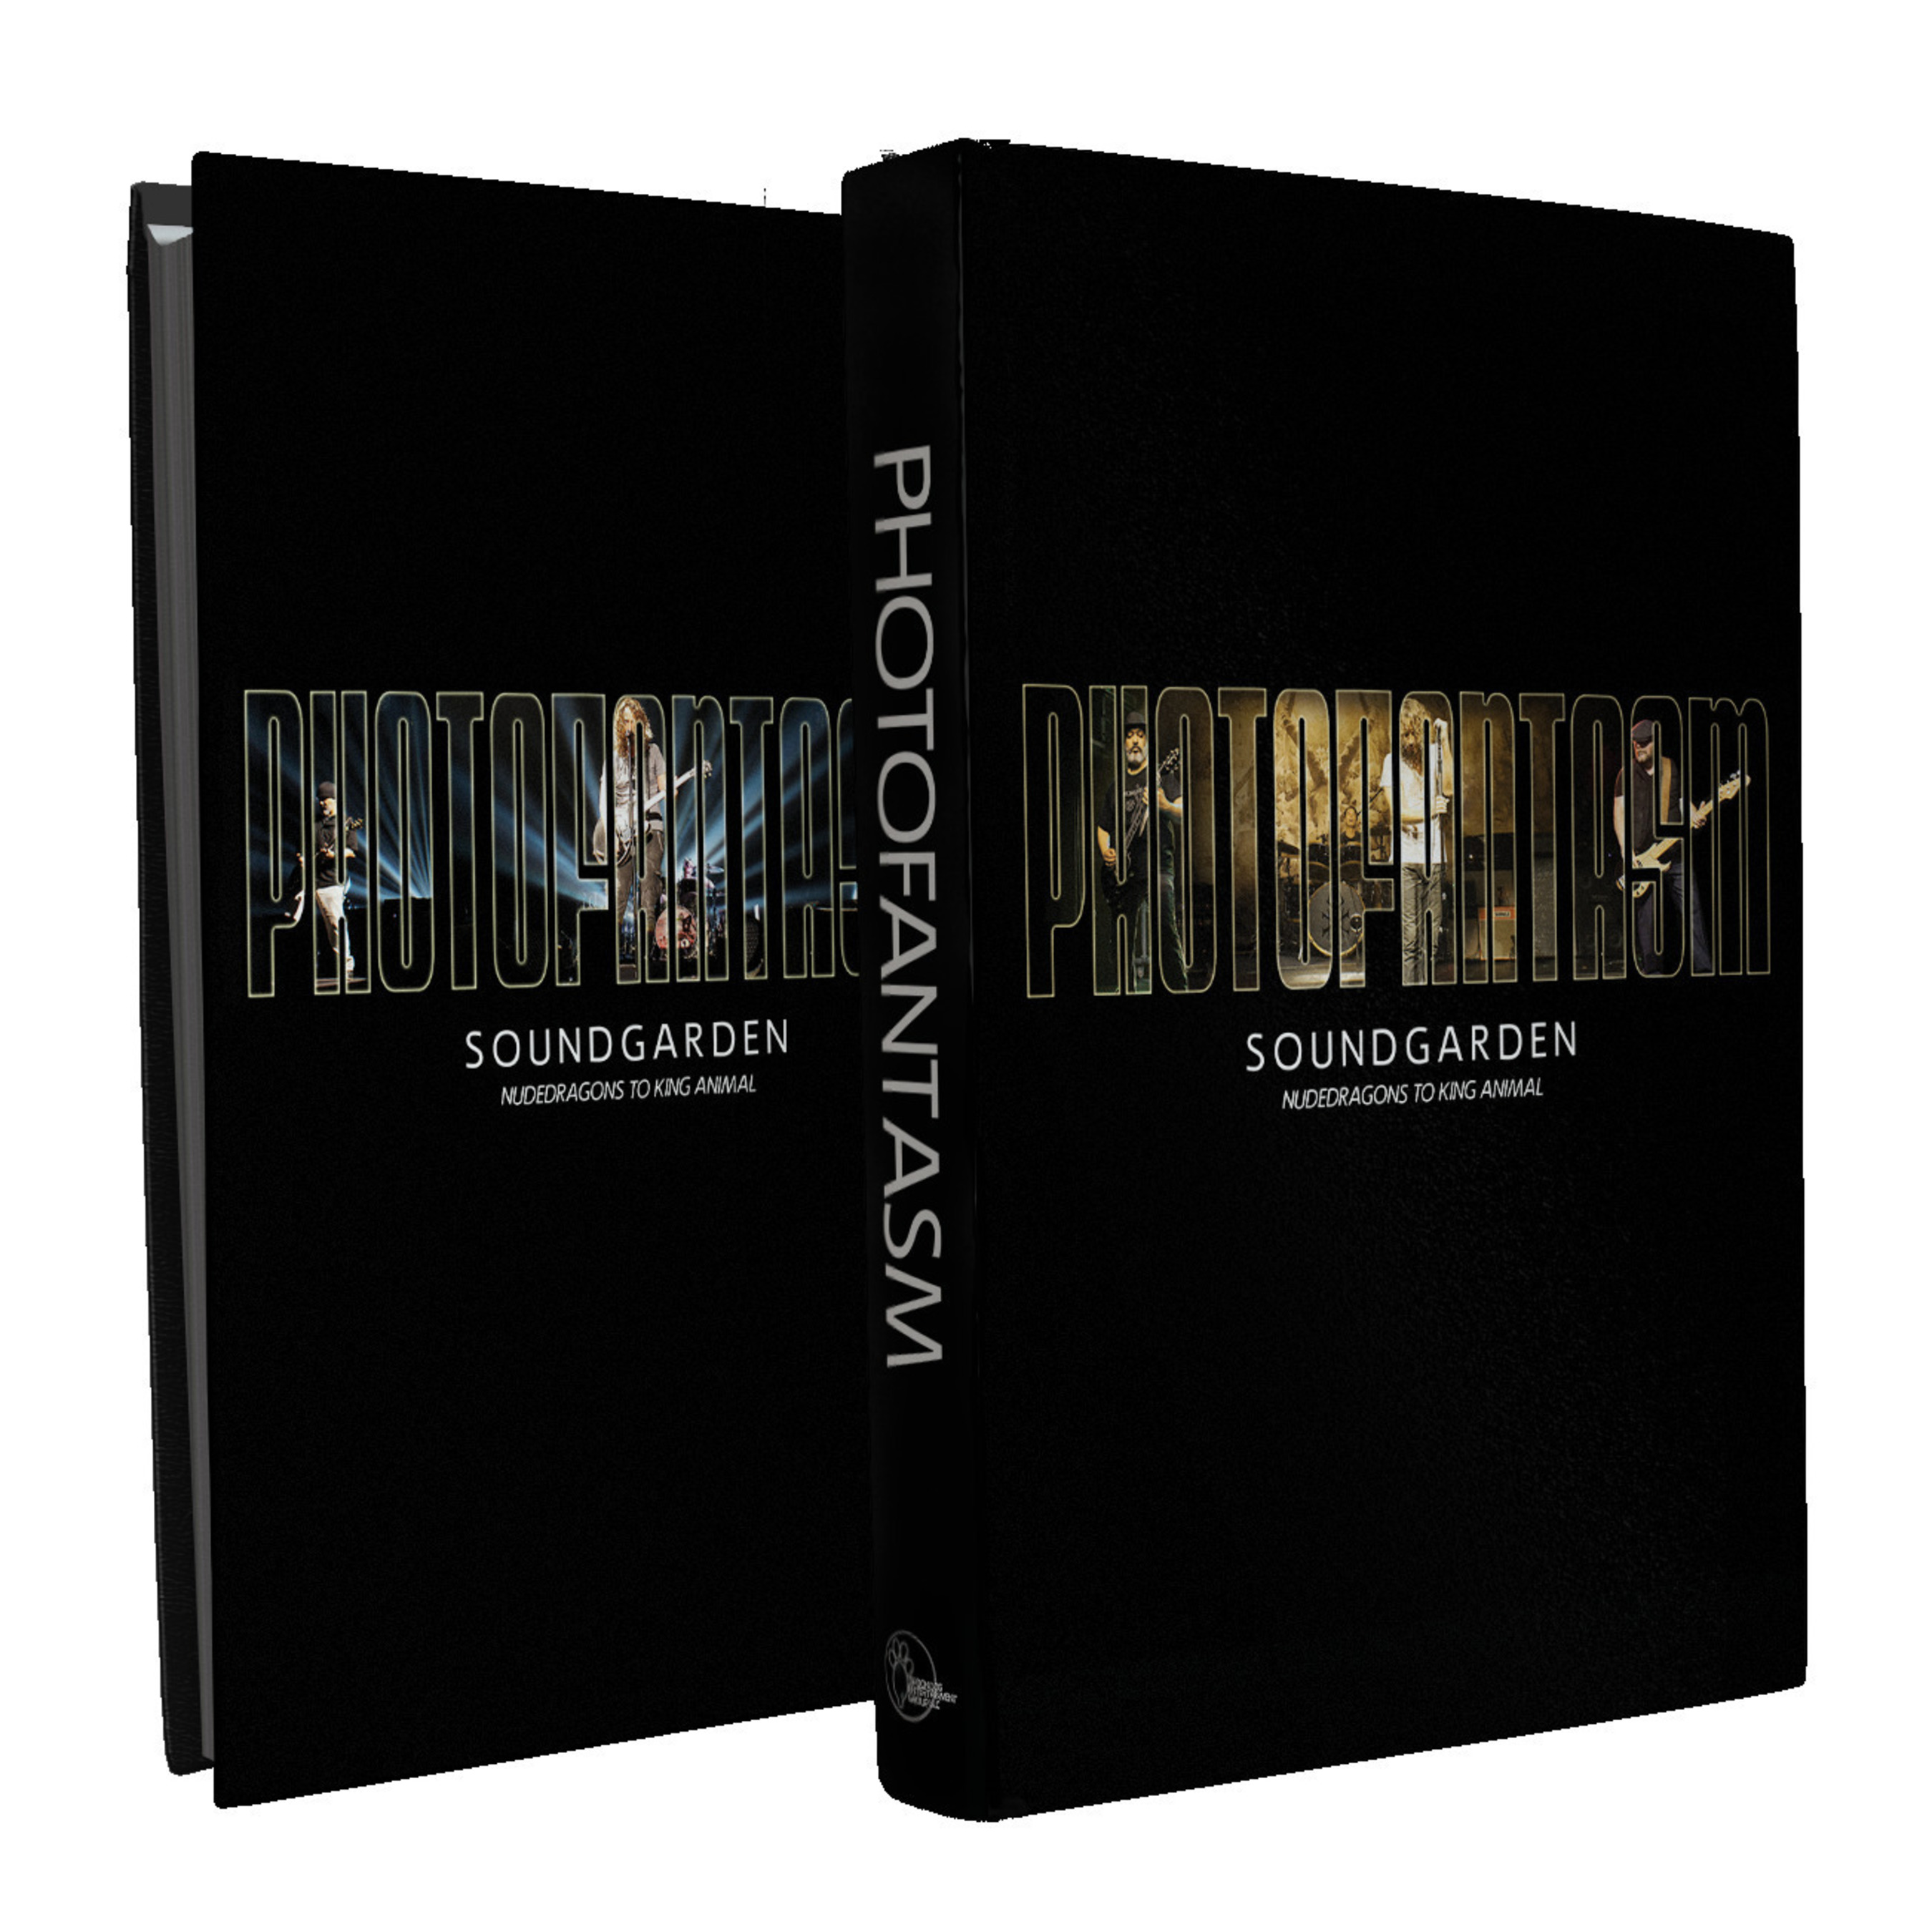 Photofantasm Soundgarden: Nudedragons to King Animal www.Photofantasm.com